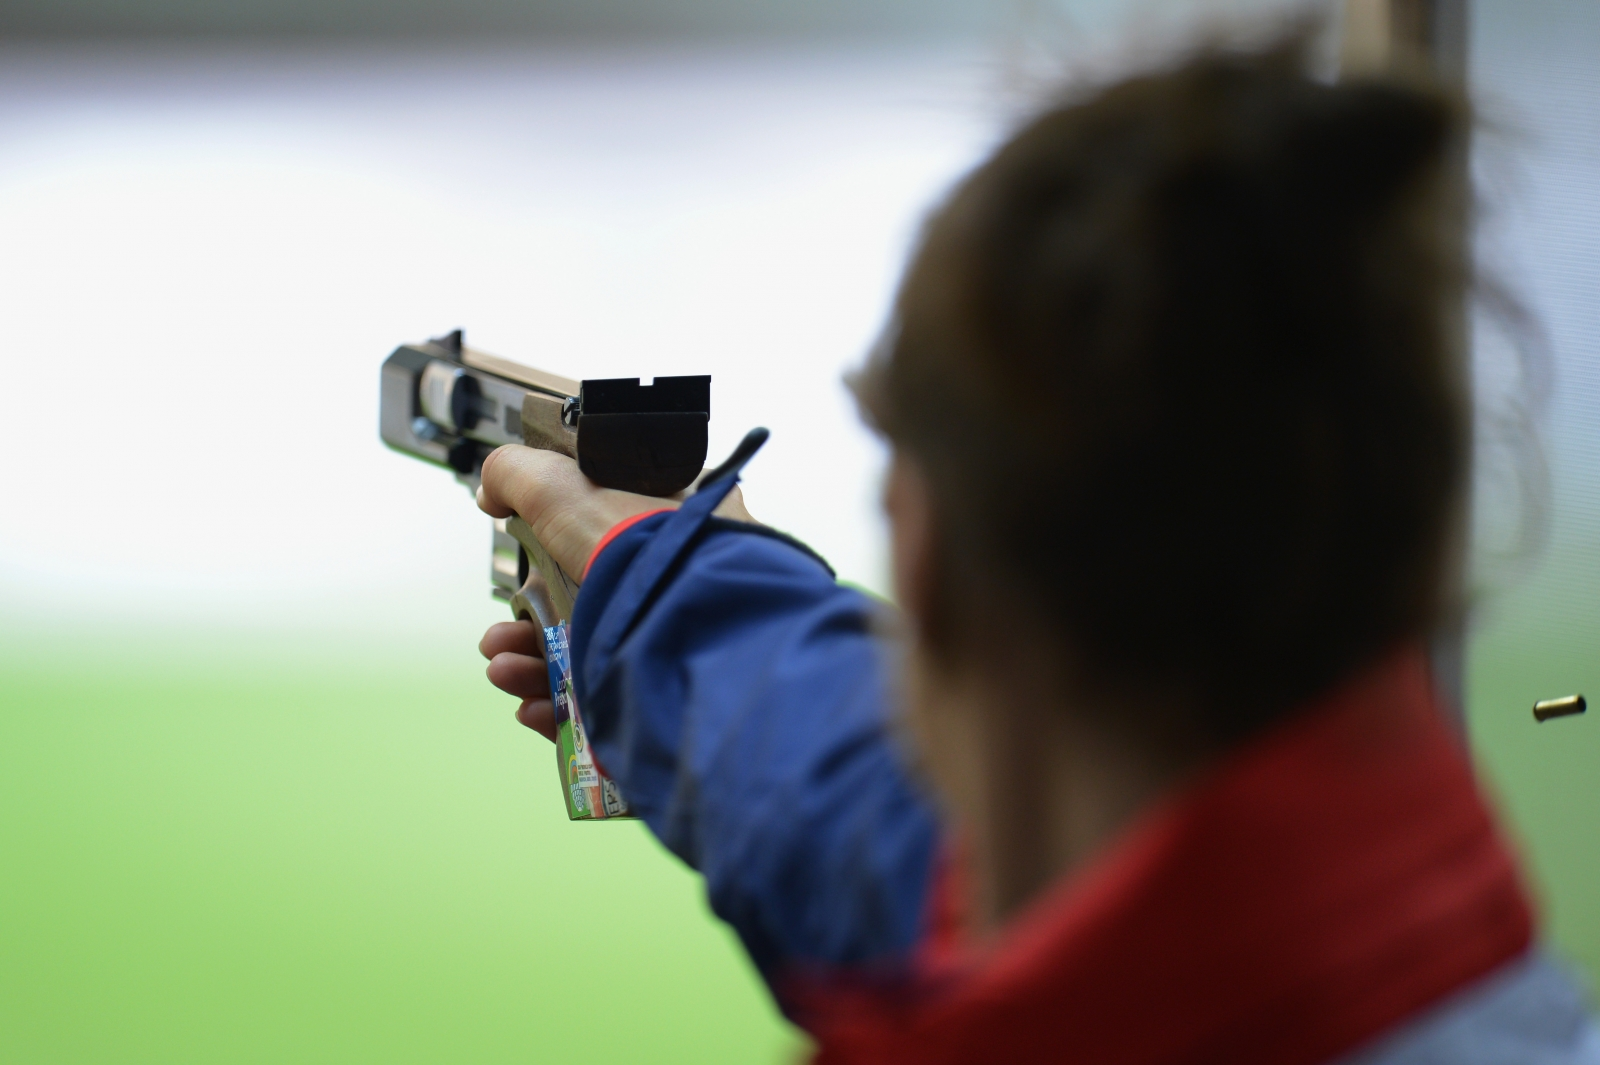 Rio 2016 Olympic shooting